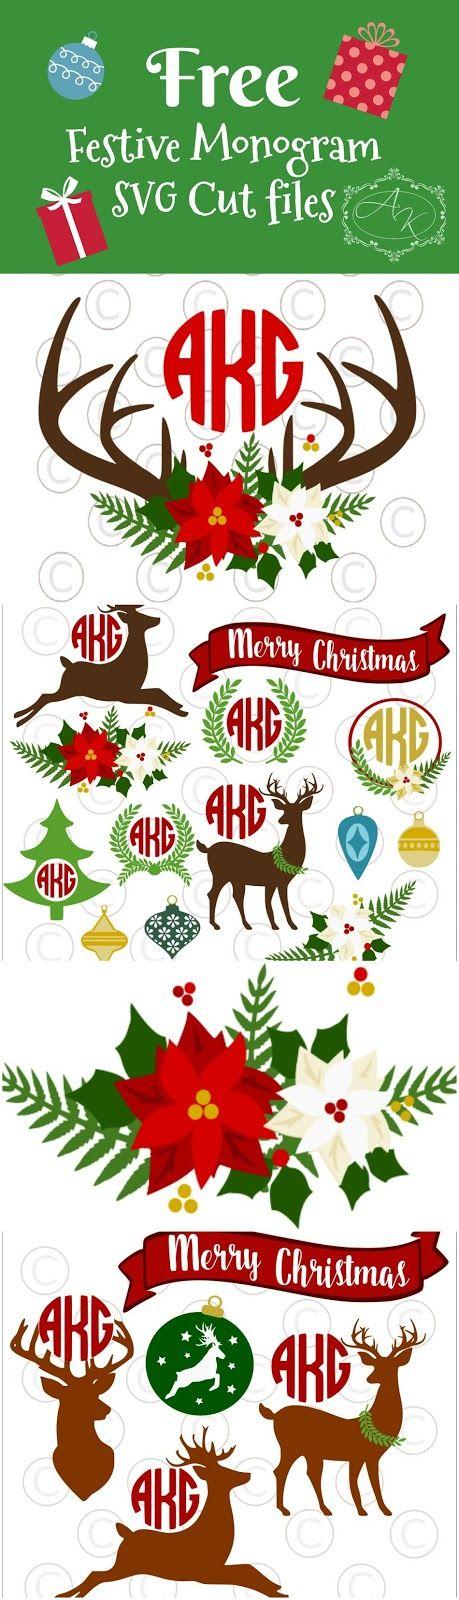 Free circle monogram SVG cut files. Christmas Svgs. Deer